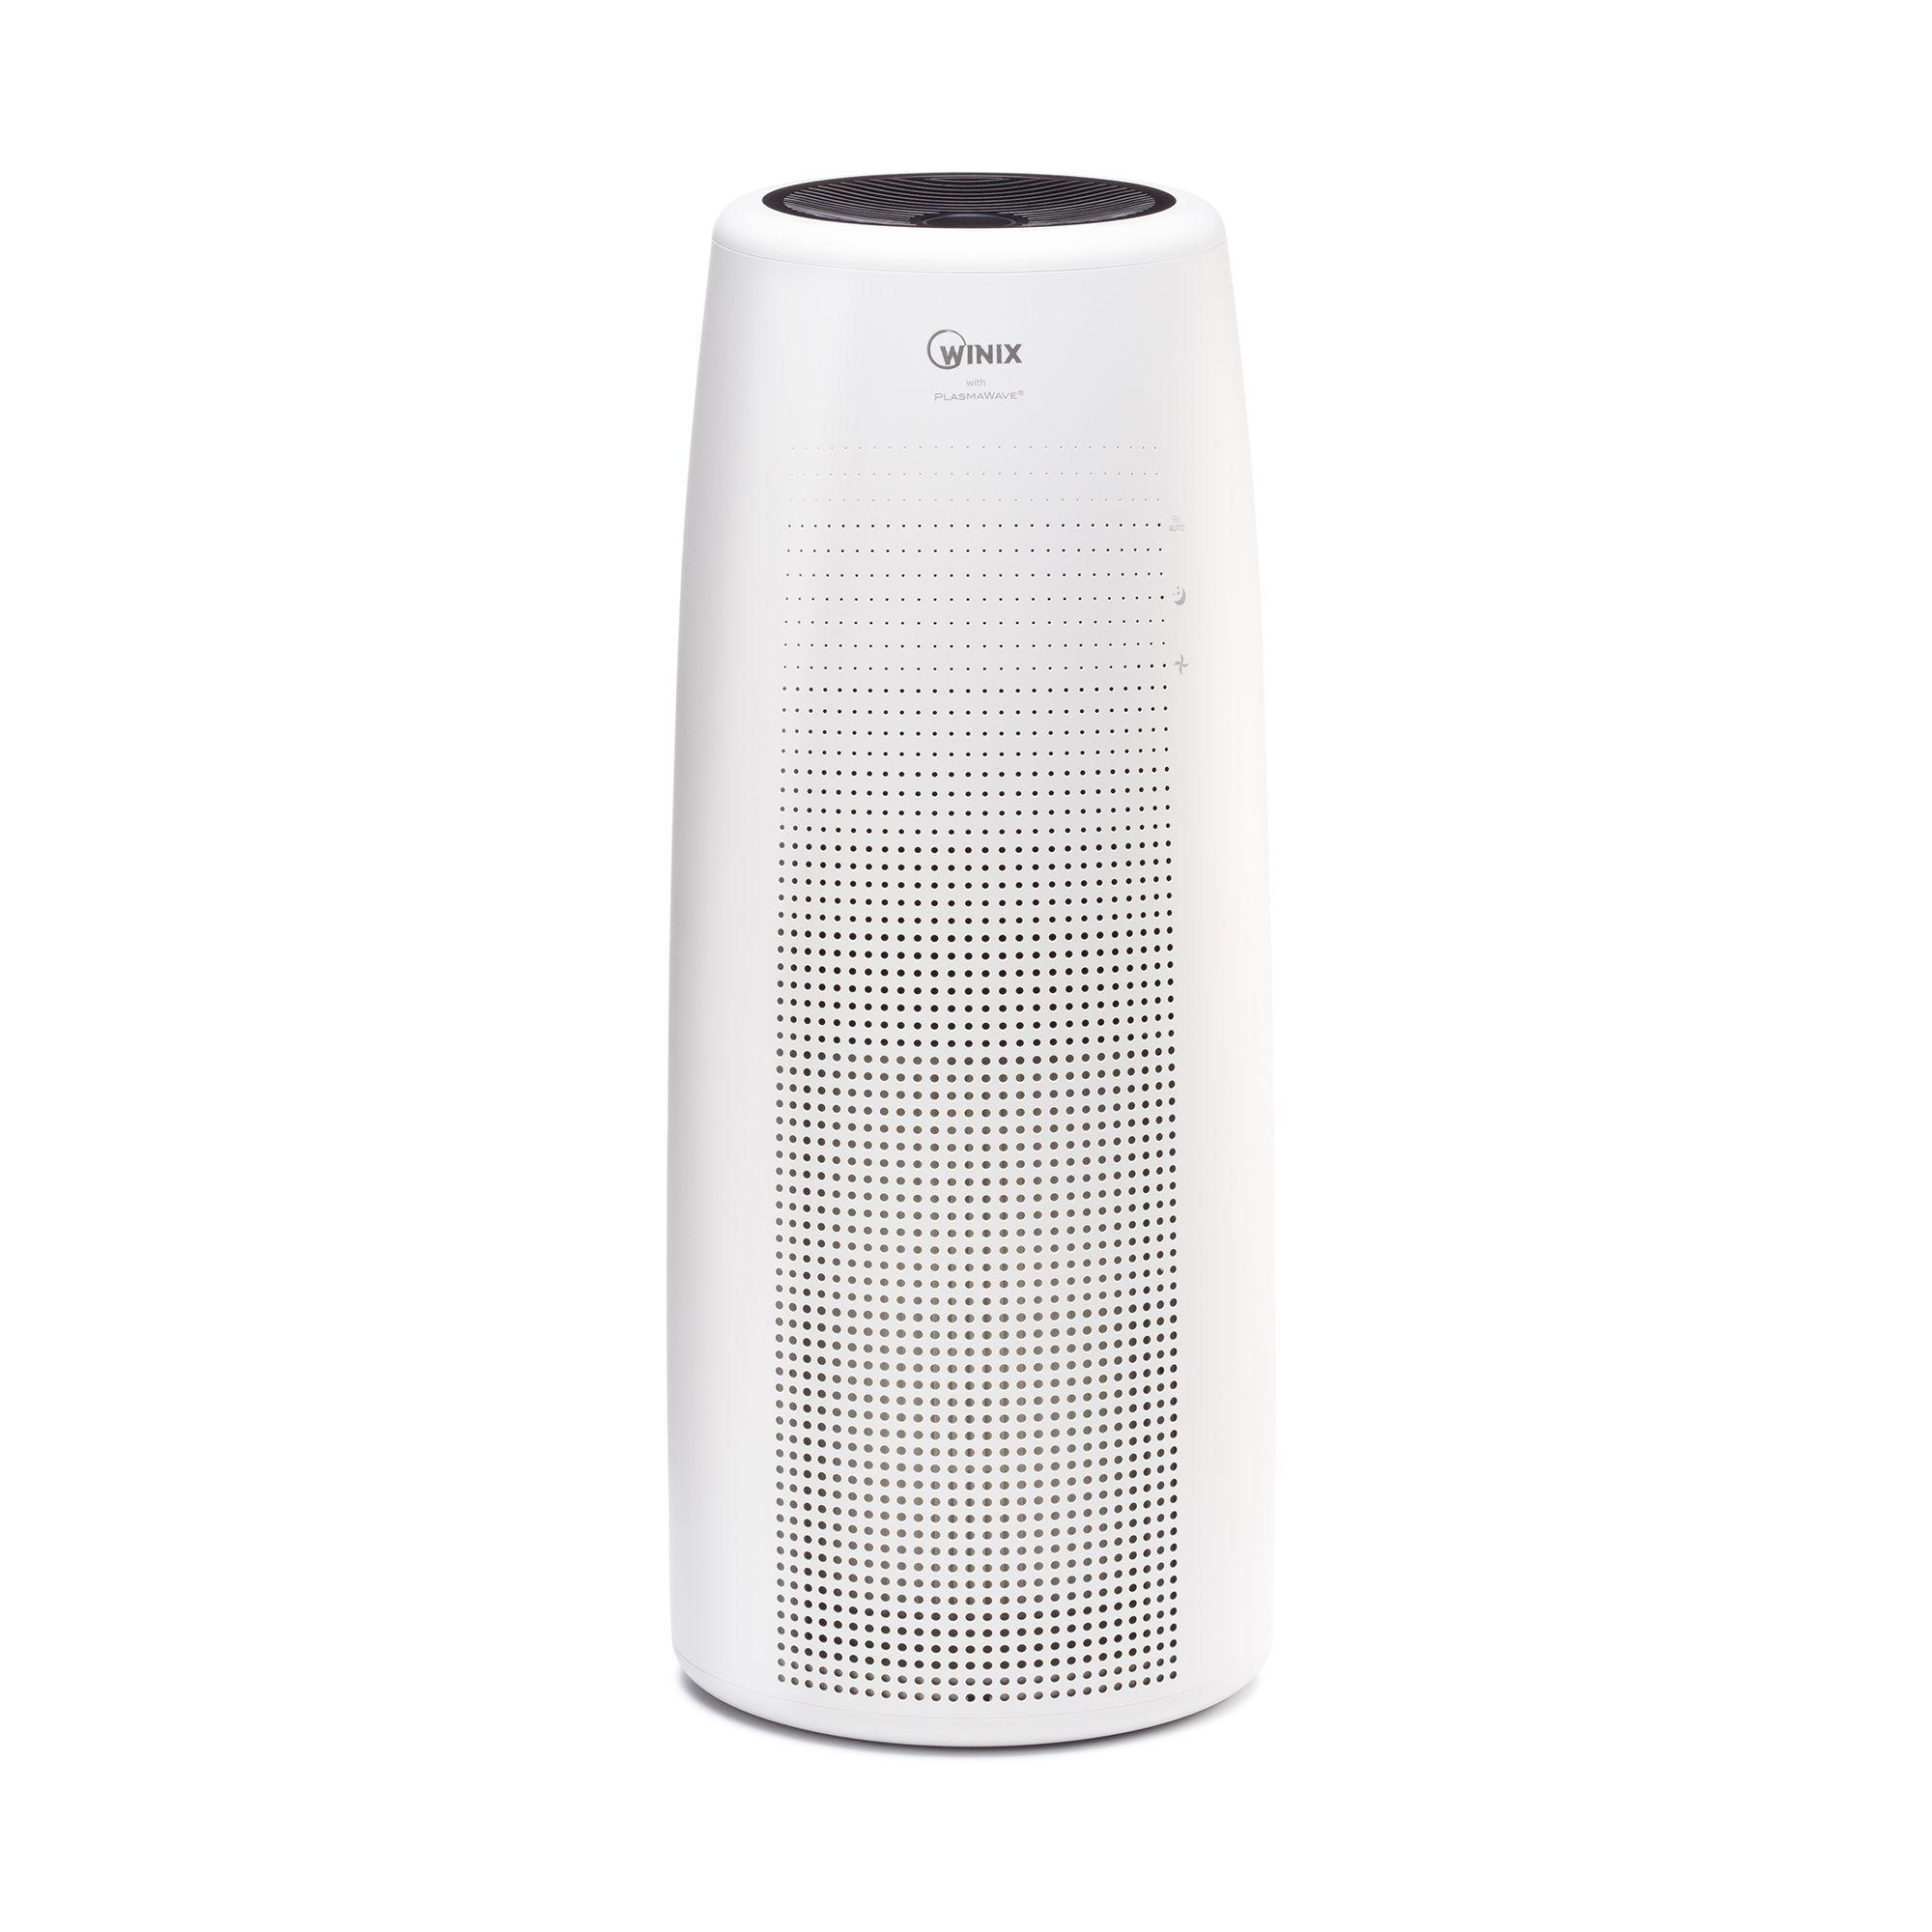 Winix NK105 True HEPA WiFi Enabled Tower Air Purifier